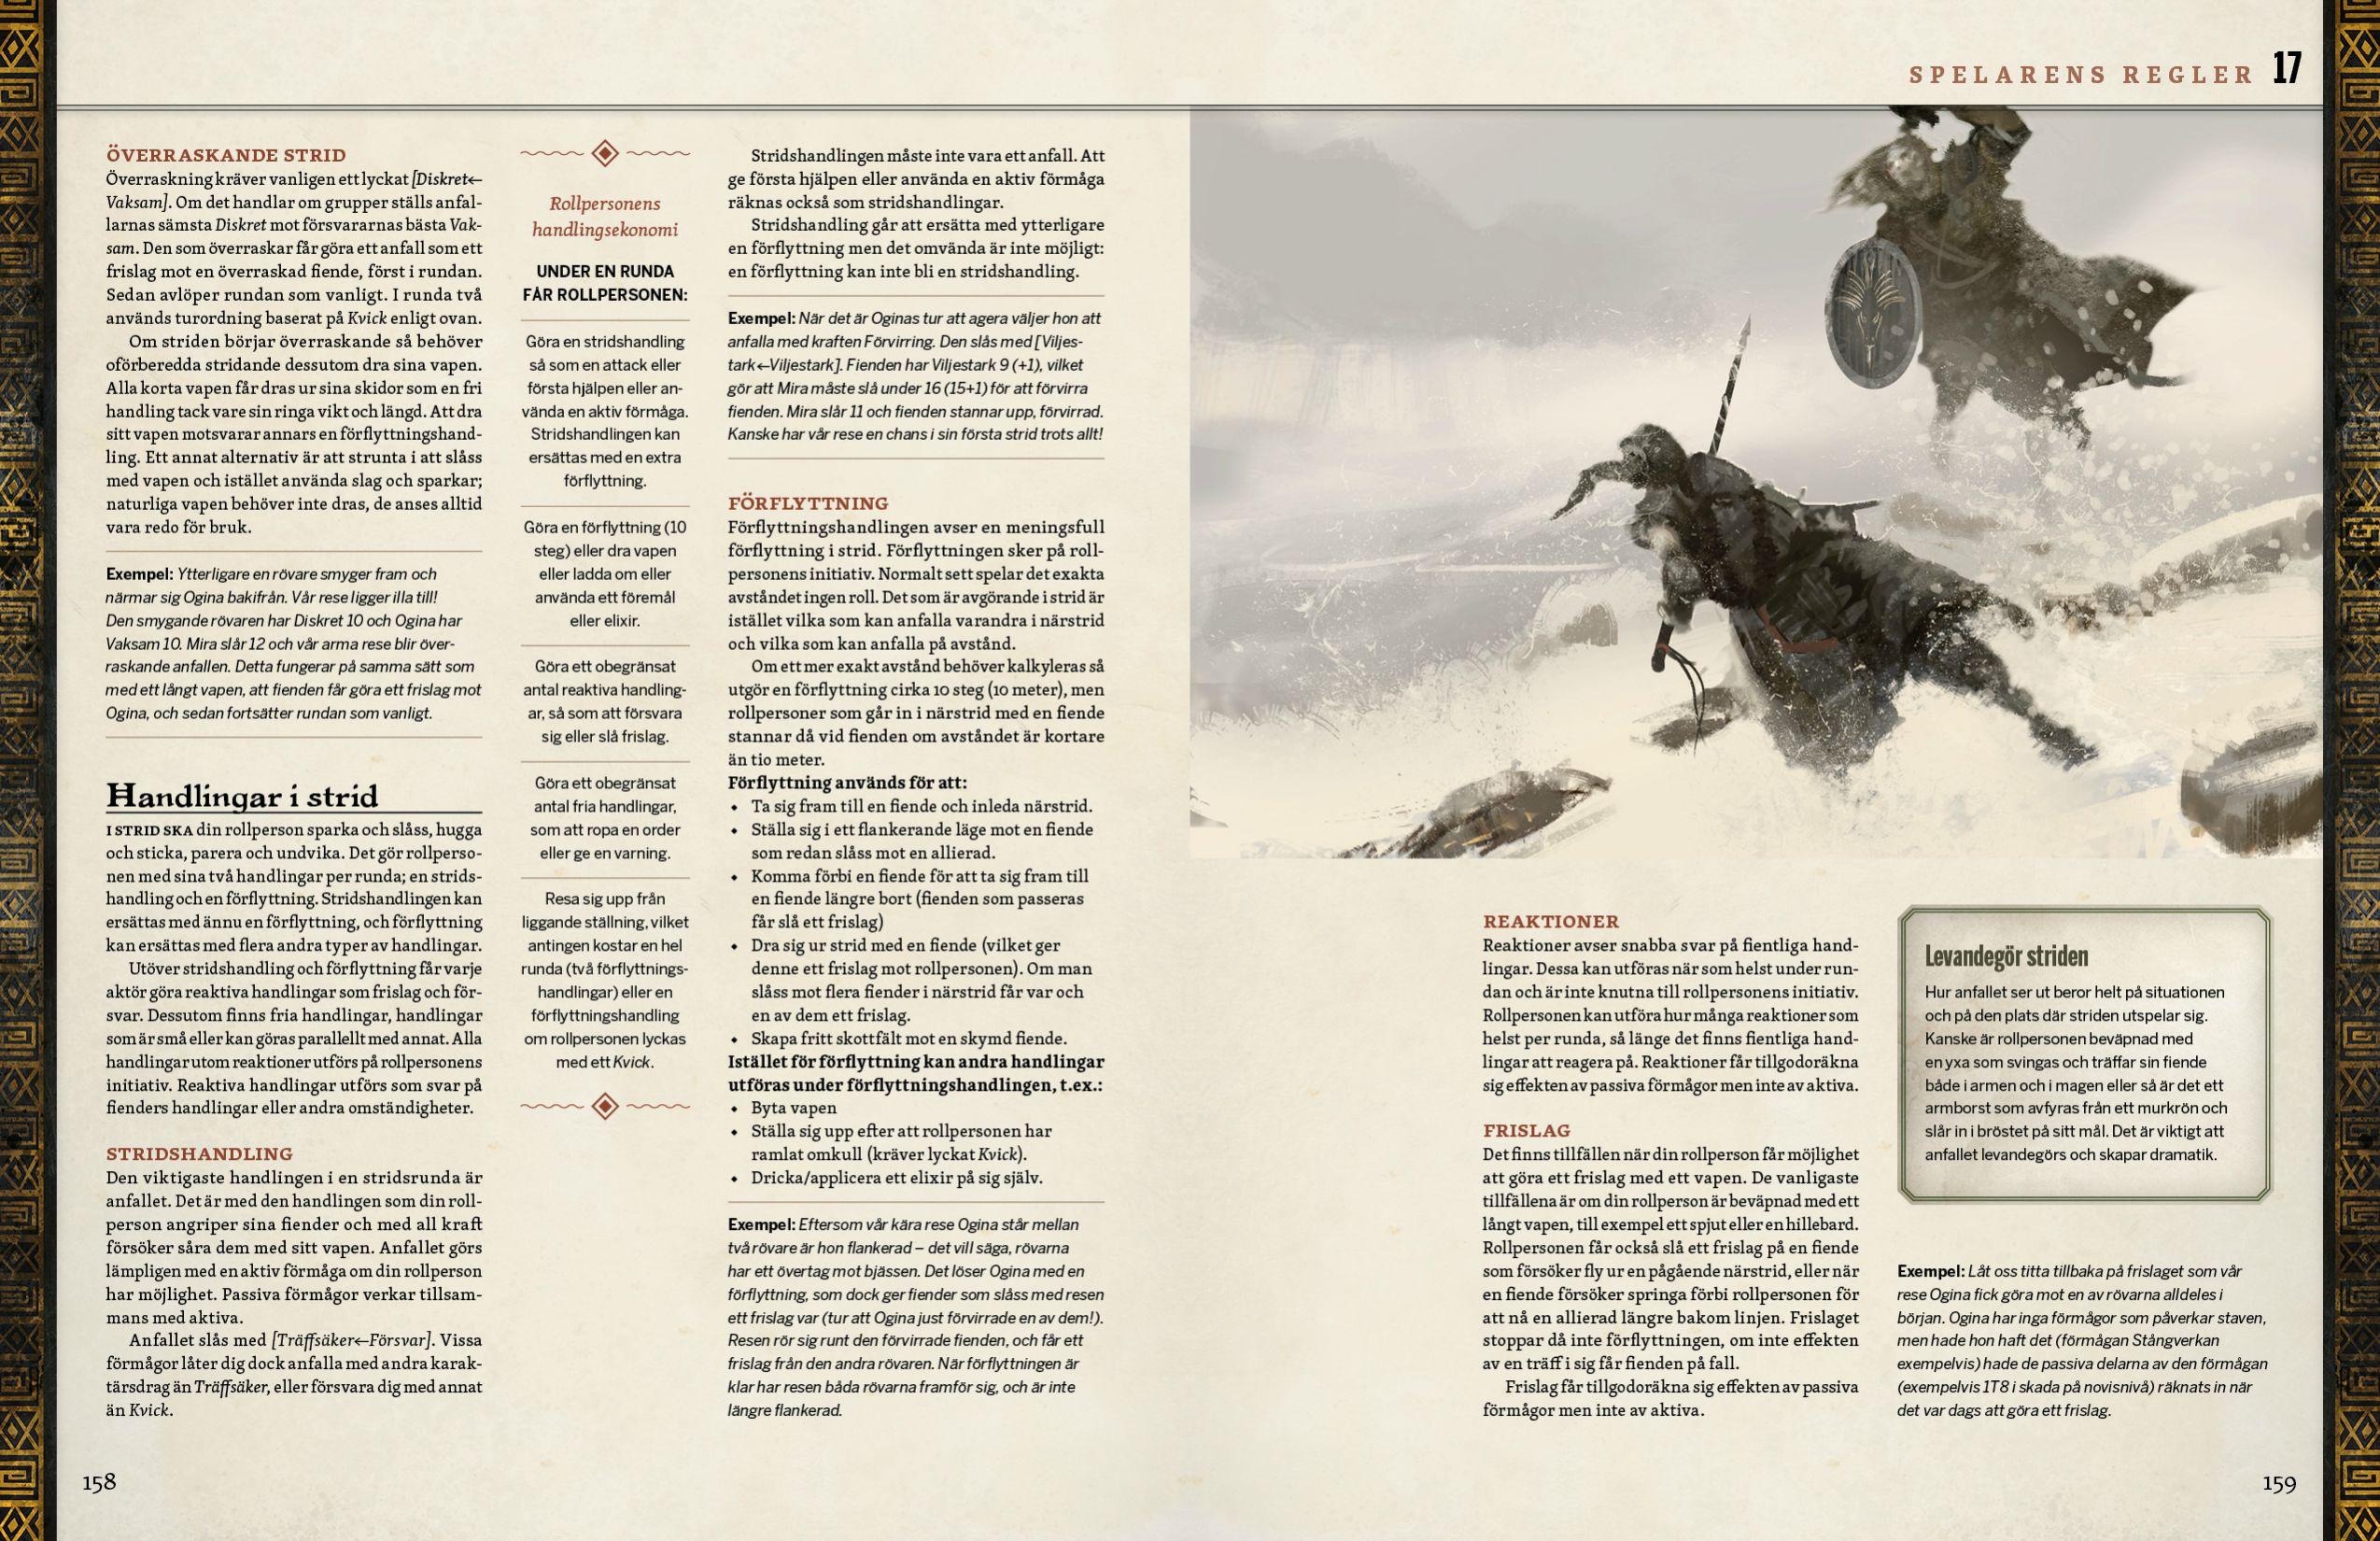 14 - Combat mechanics